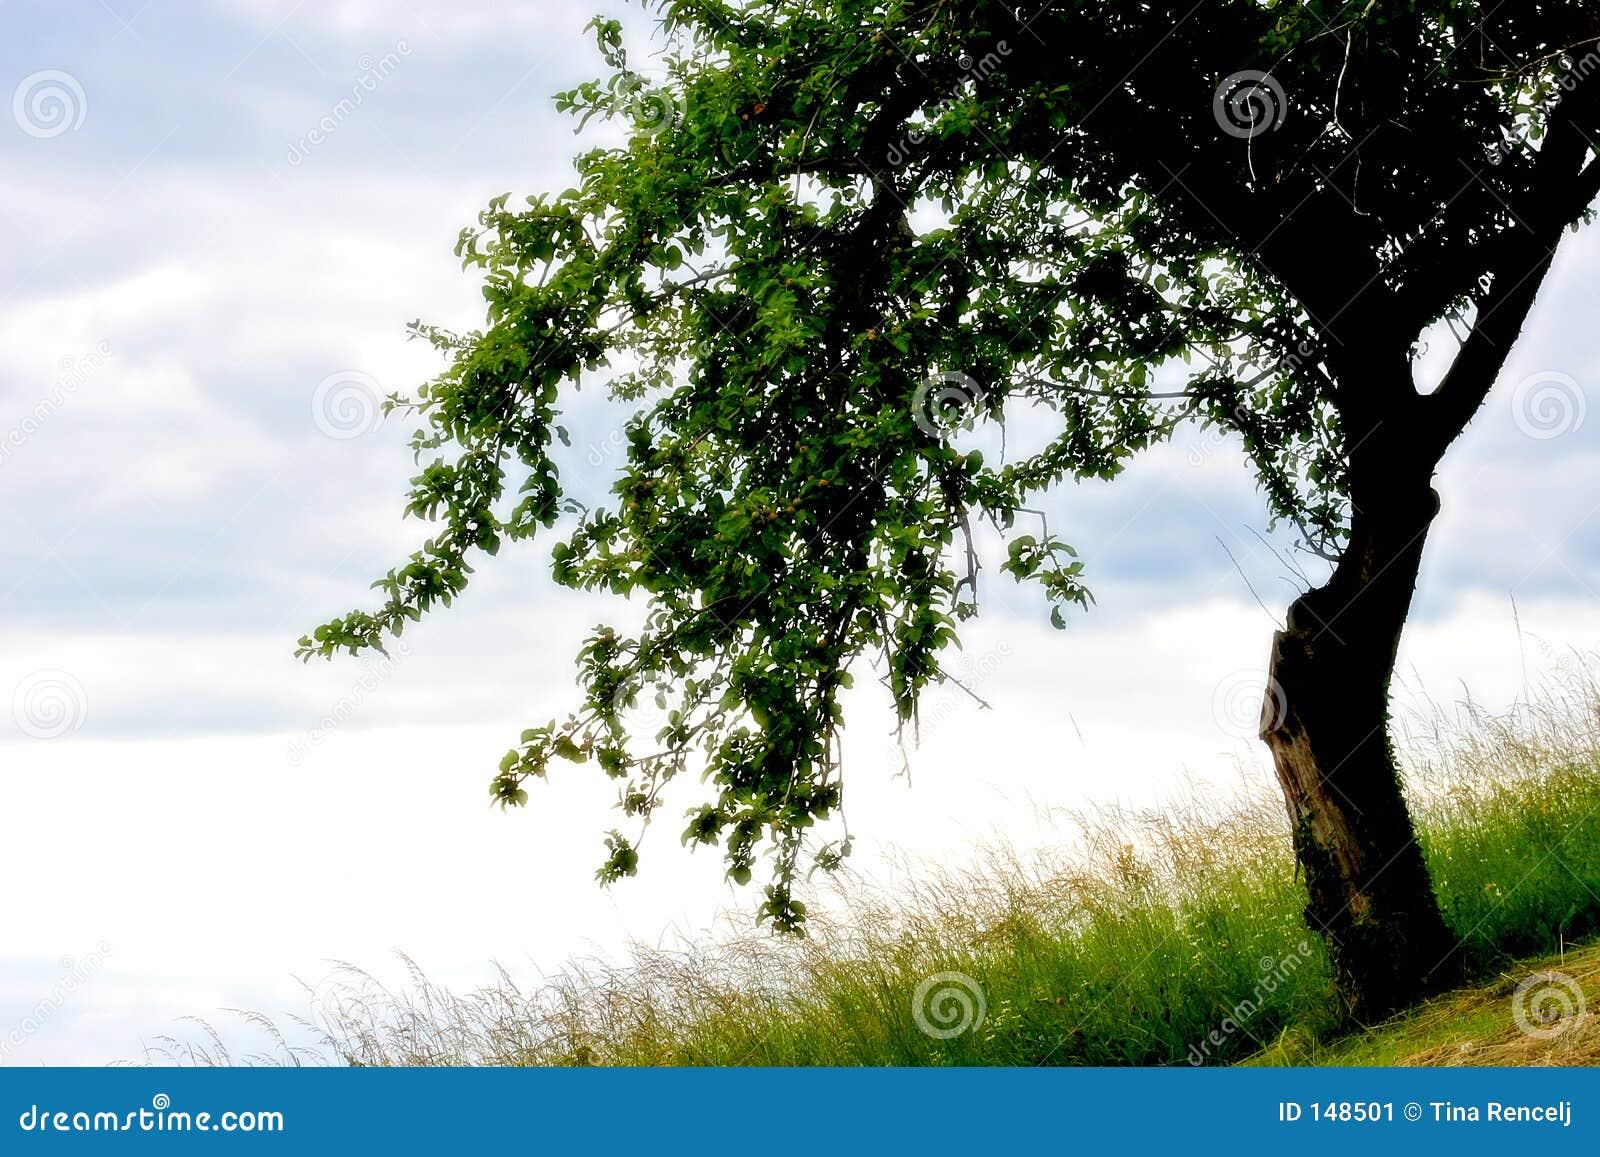 Tree In My Dream